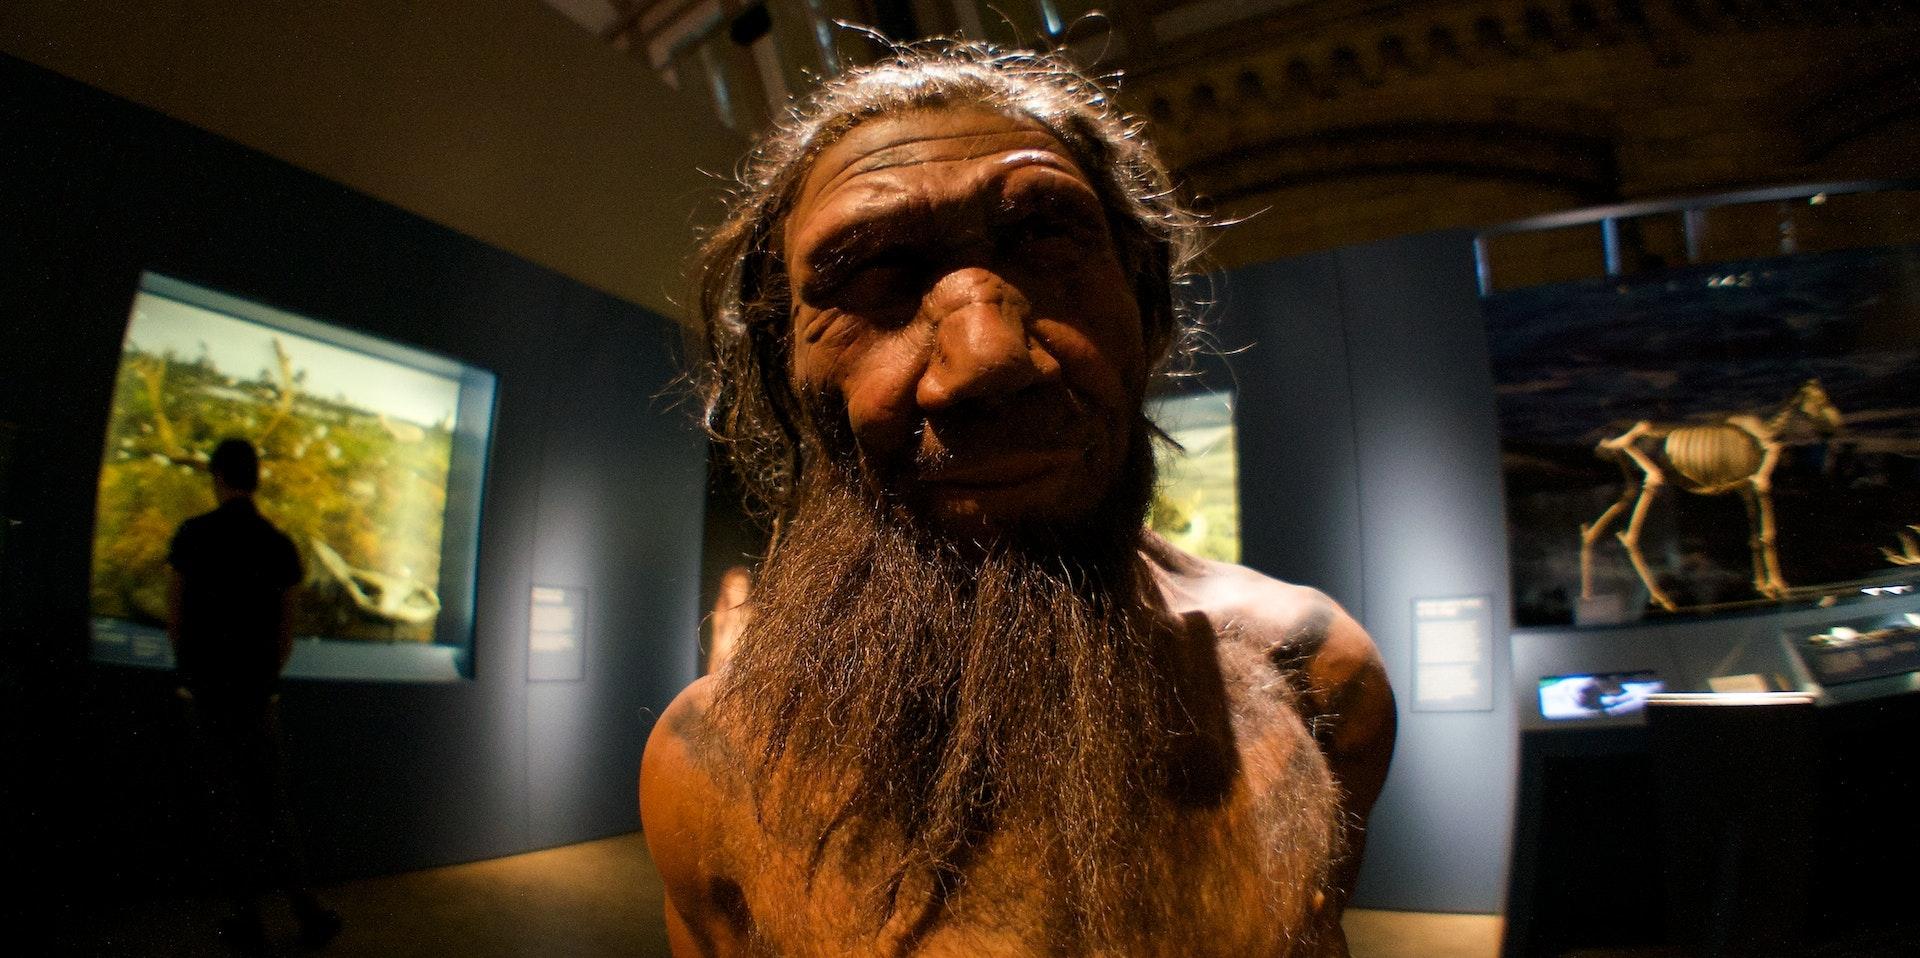 Neanderthal Bone Scars Reshape What We Assume About Their Behavior